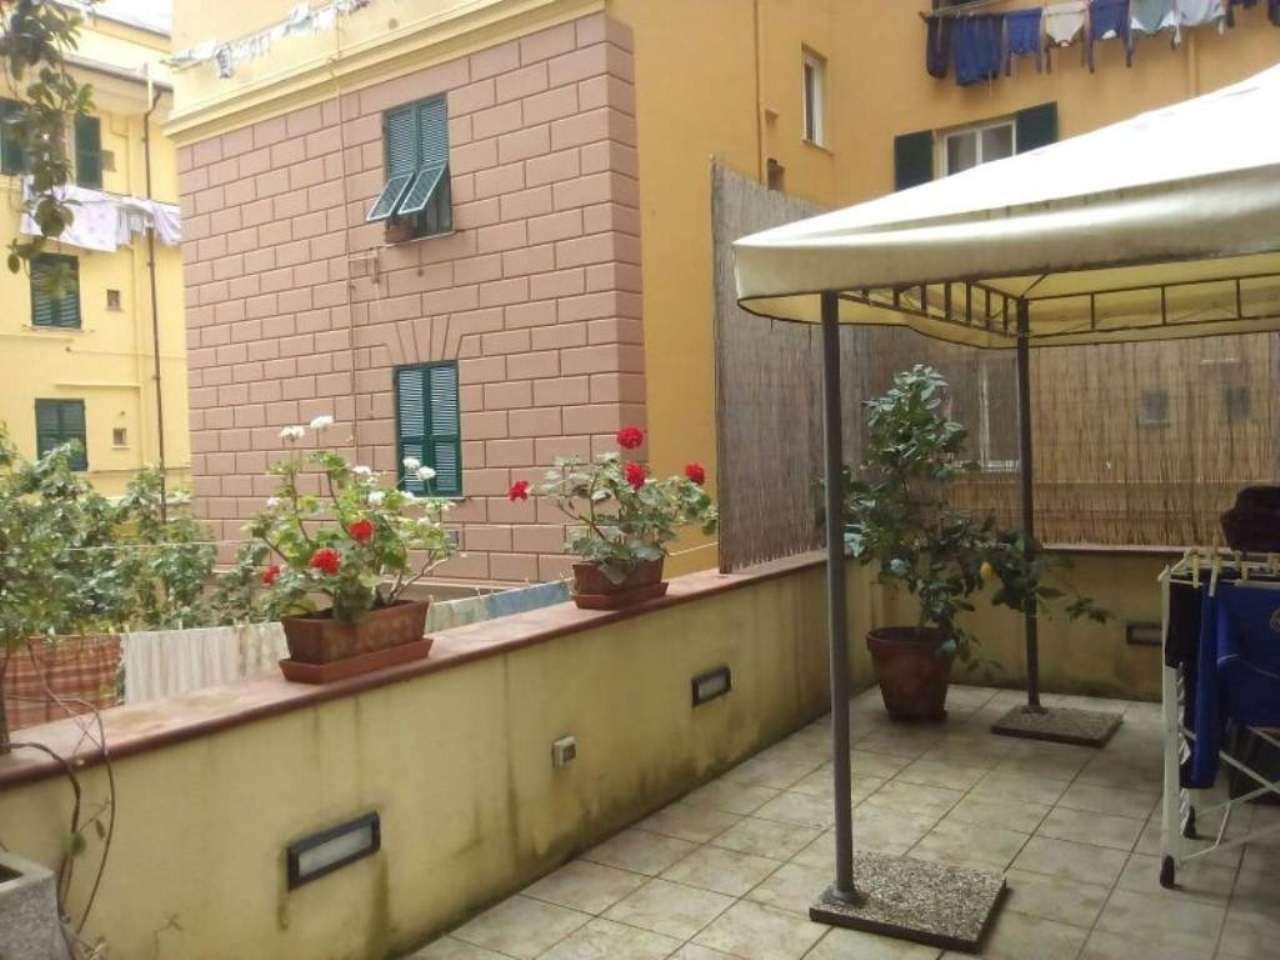 Bilocale Genova Via Avezzana 1